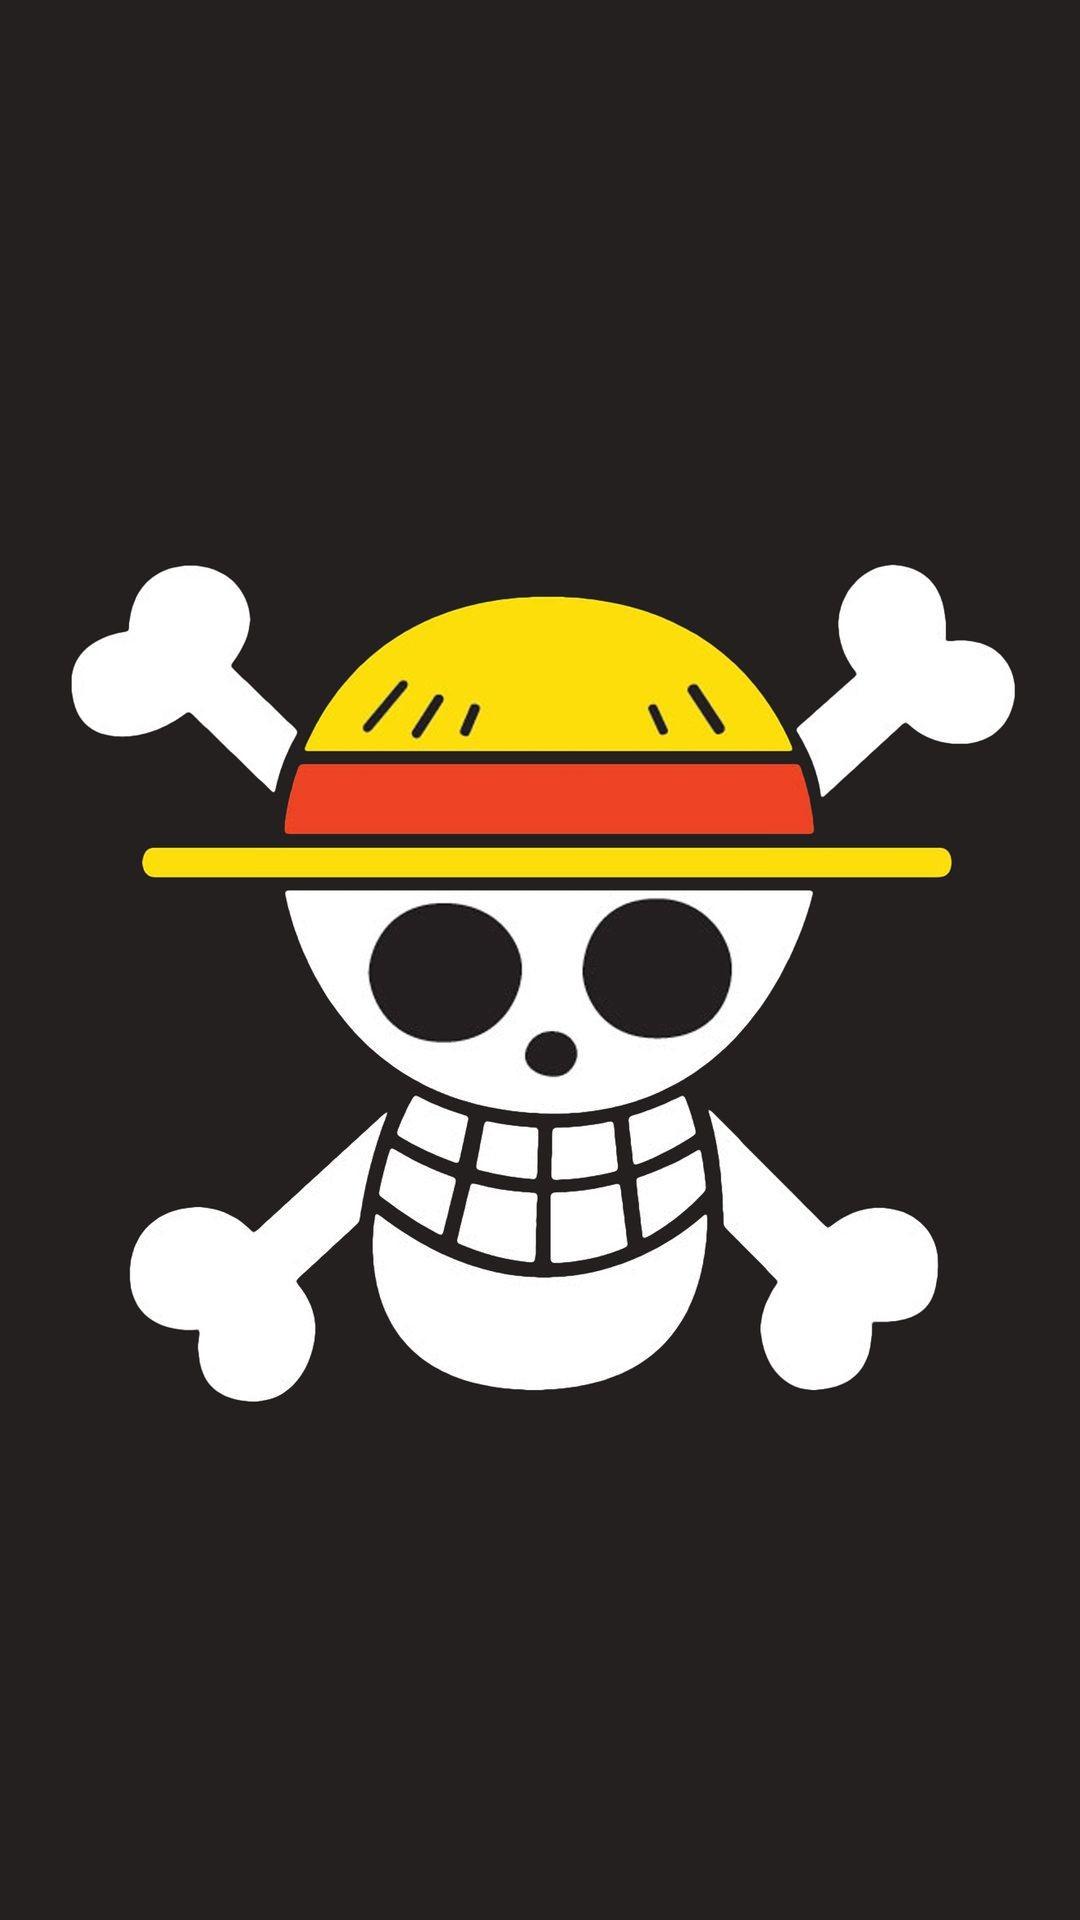 21 Luffy Logo Wallpapers On Wallpapersafari